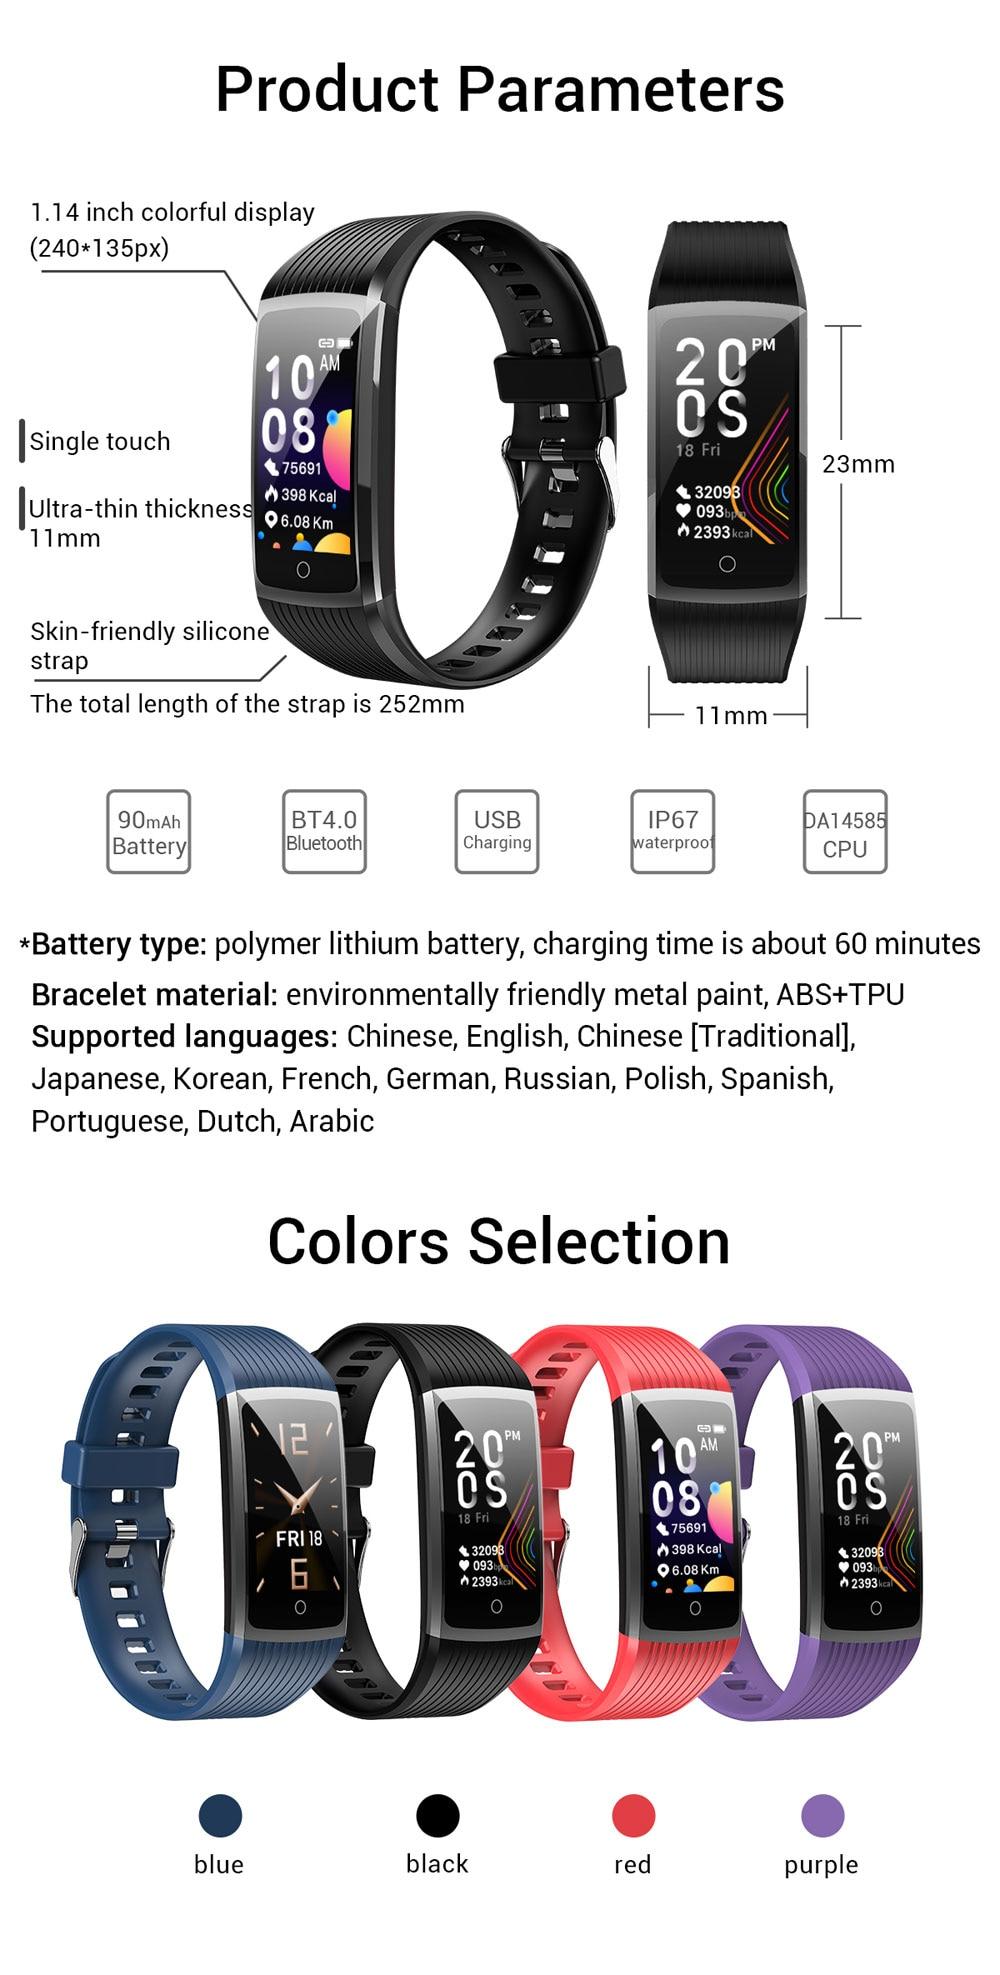 Hbe5bd9059bfa4bab90e4ceffe868a309g 2020 Fitness Bracelet Blood Pressure Fitness Tracker Waterproof Smart Bracelet Heart Rate Smart Band Watch Wristband Men Women